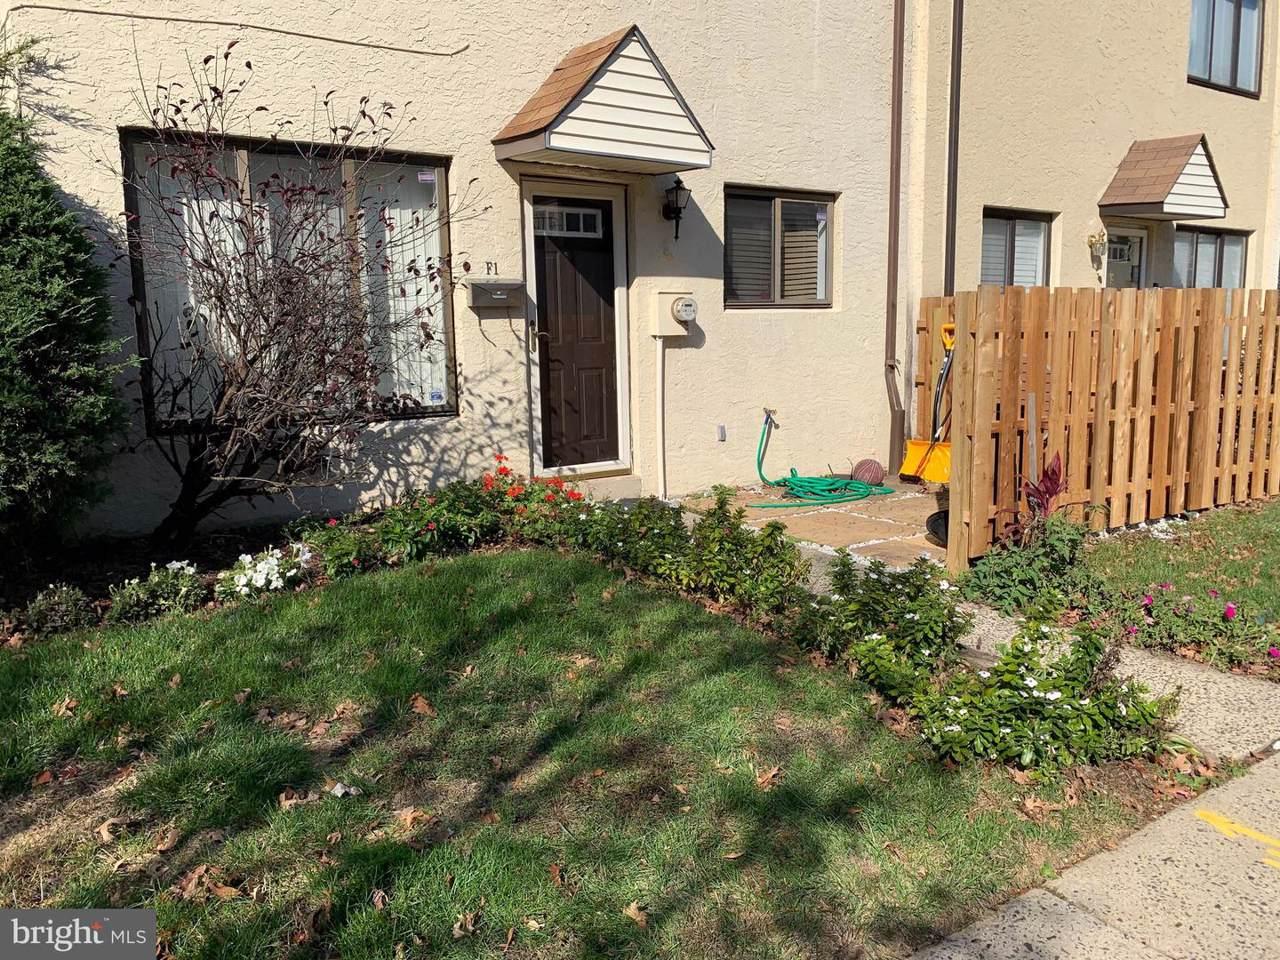 7601 Crittenden Street - Photo 1